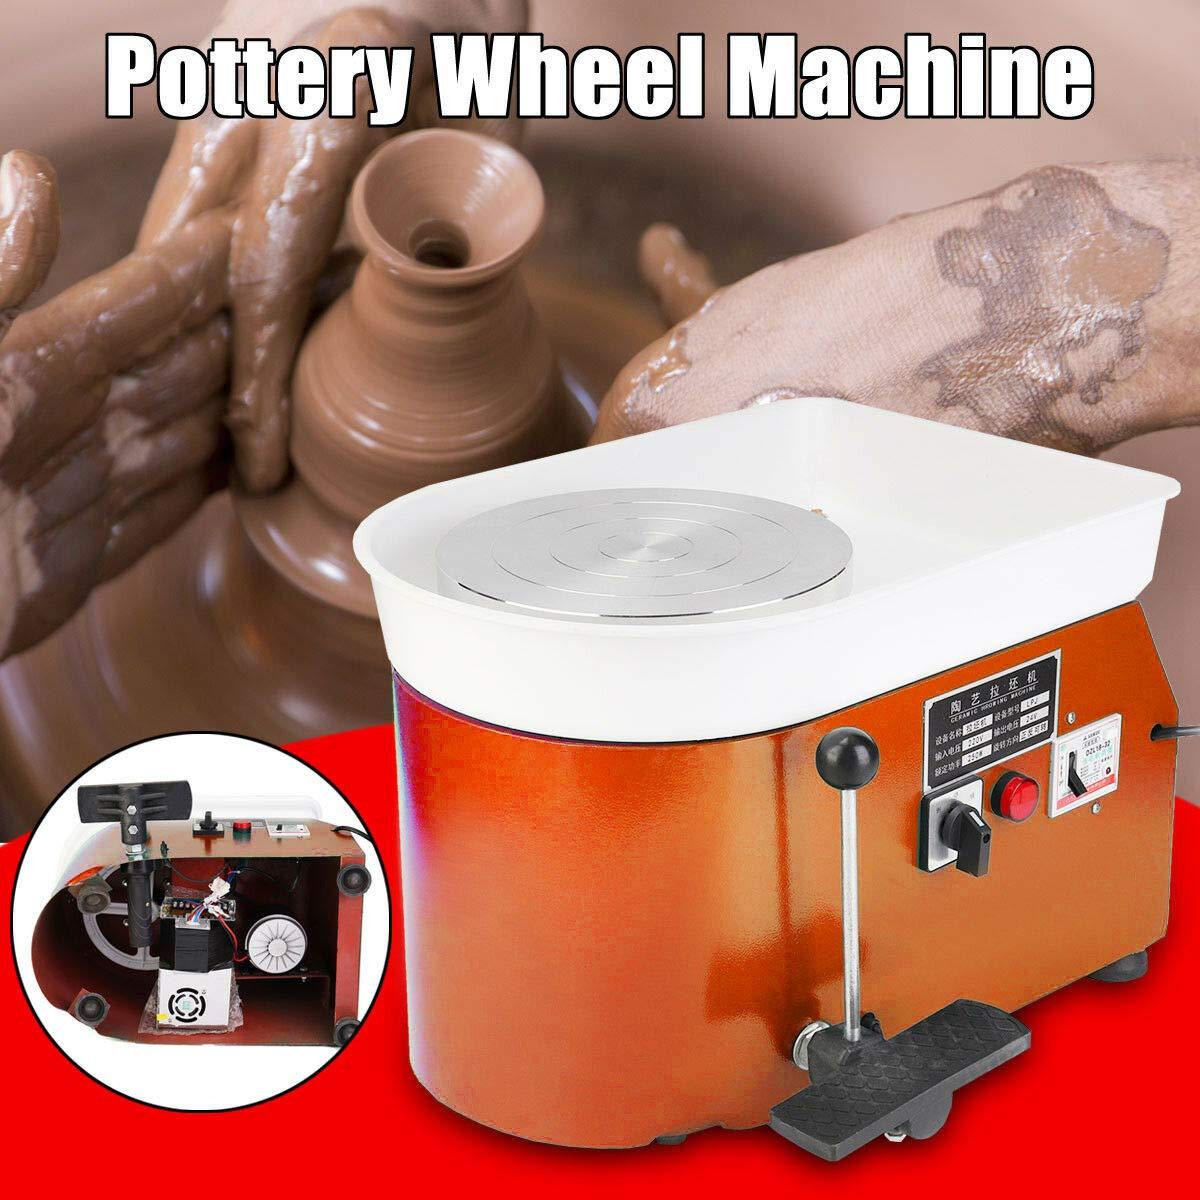 DONNGYZ 25CM Pottery Wheel Pottery Forming Machine 350W Electric Pottery Wheel DIY Clay Tool Ceramic Machine Work Clay Art Craft DIY Grey